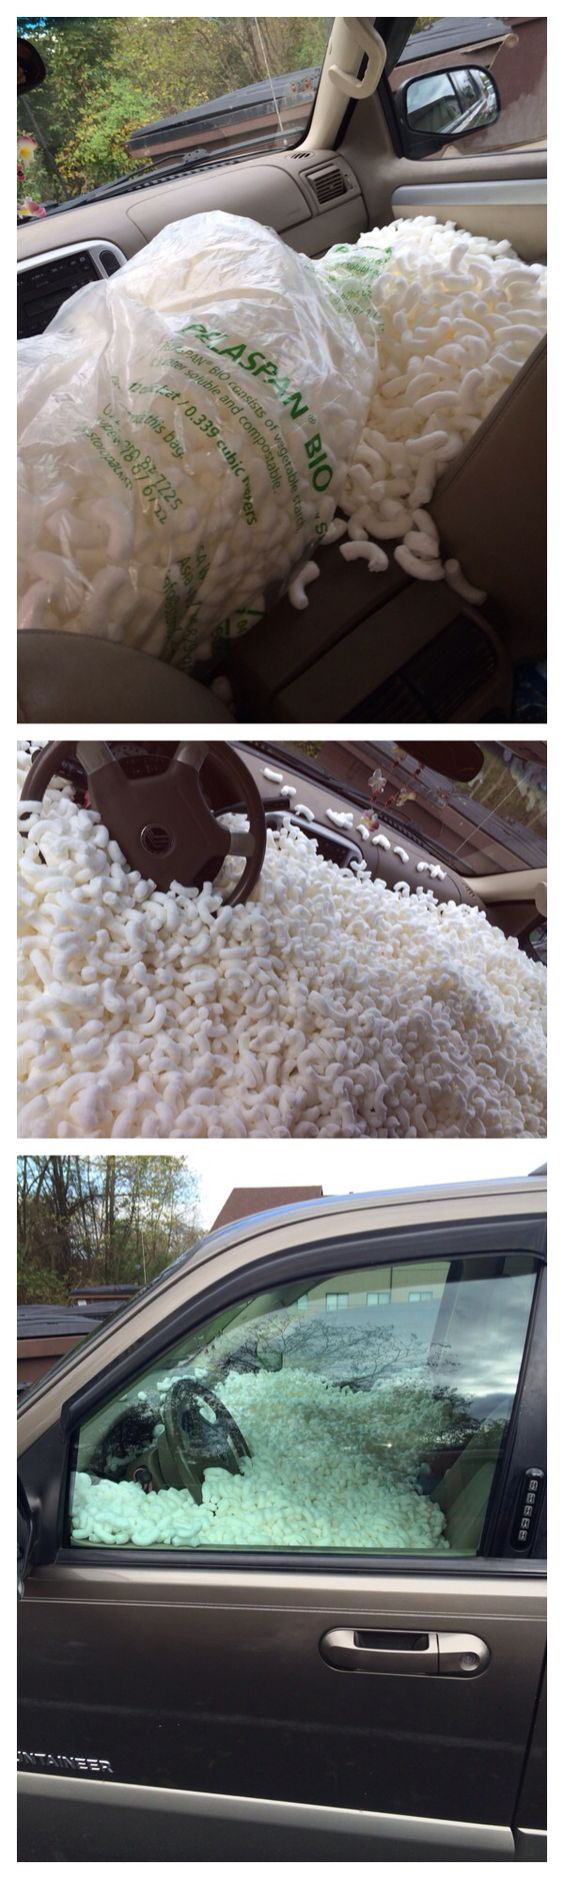 Packing peanuts car prank